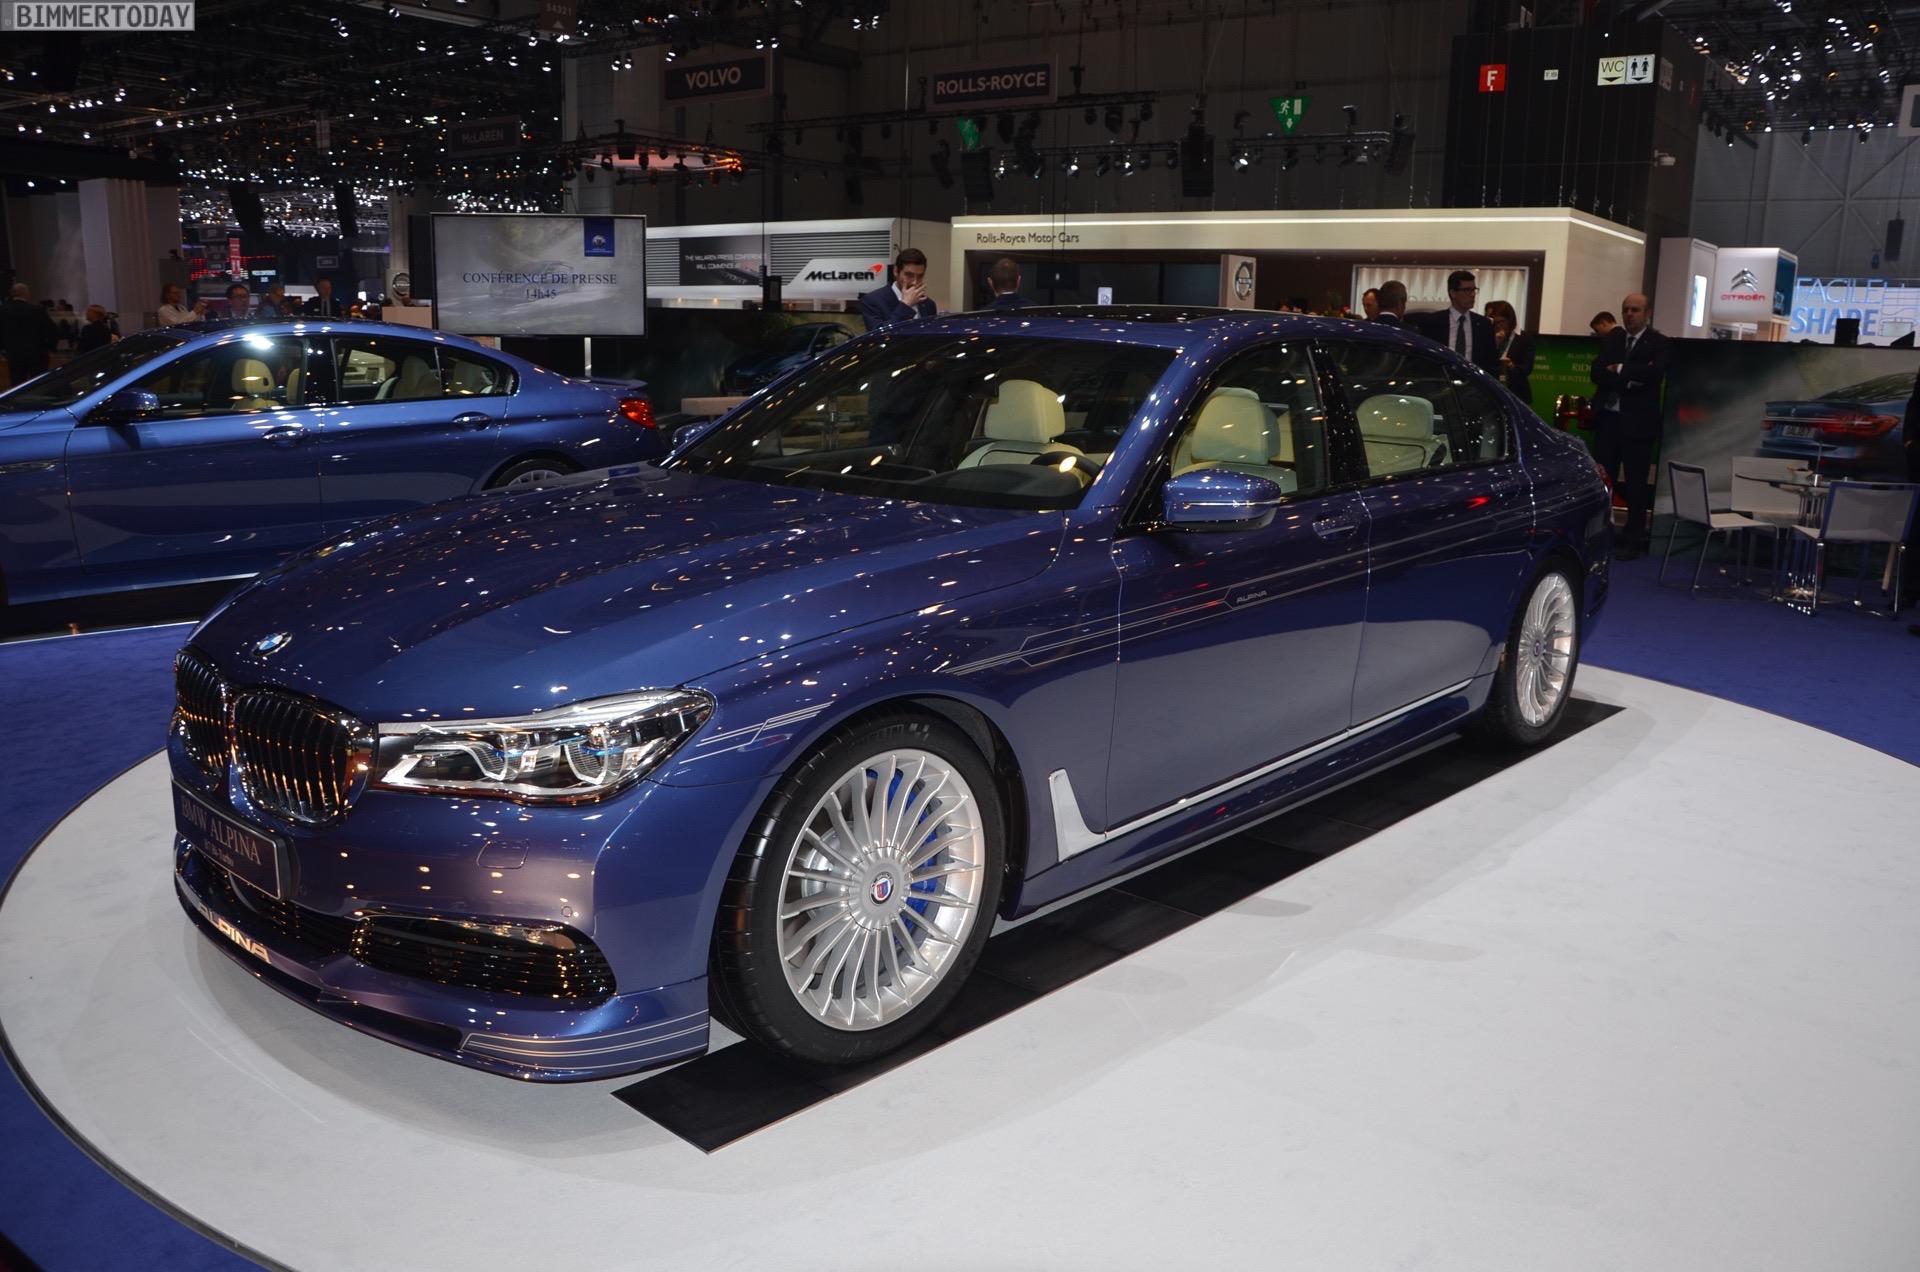 BMW Alpina B7 xDrive G12 V8 BiTurbo 7er Autosalon Genf 2016 LIVE 18